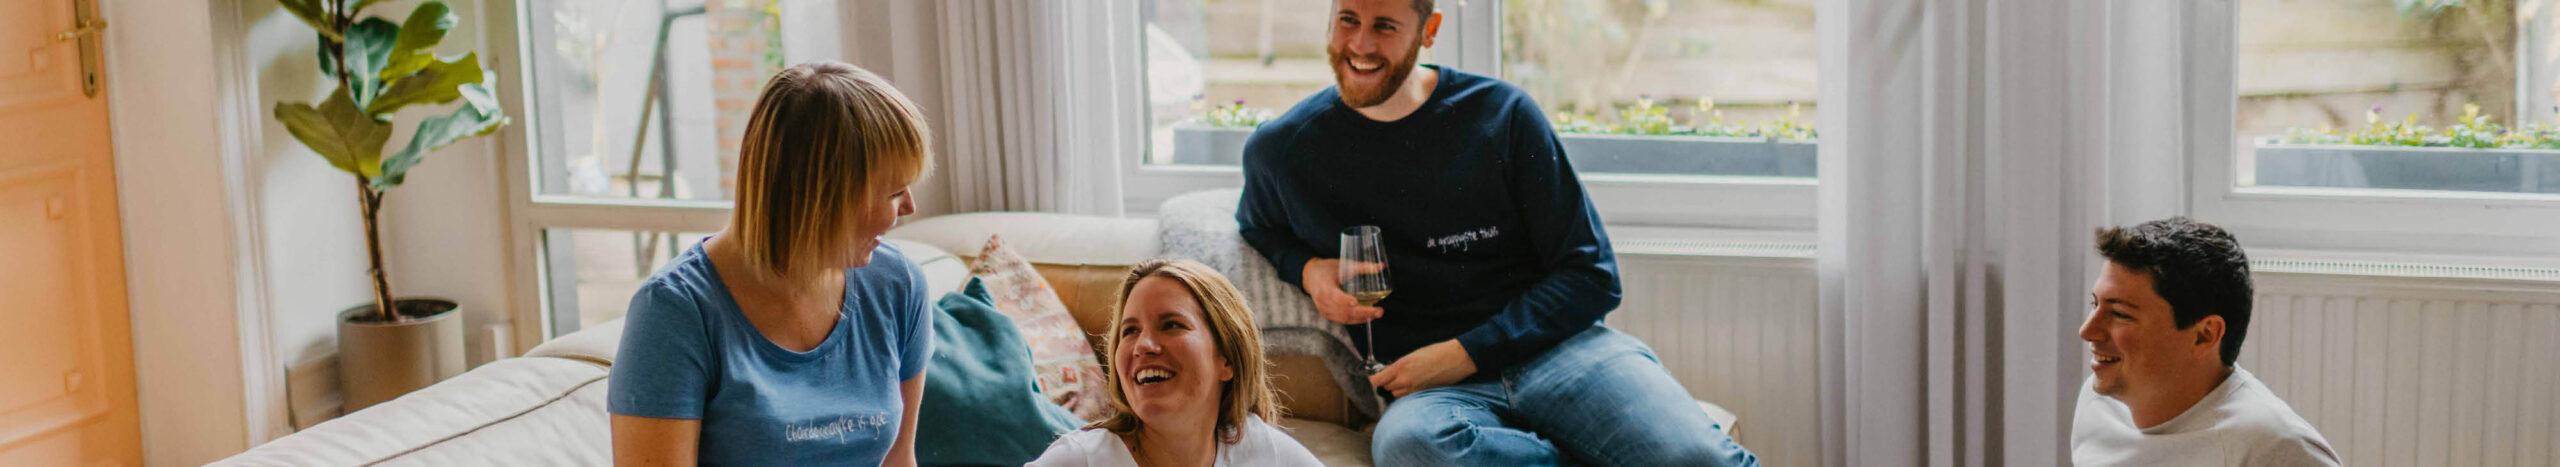 Anonymous Albert T-shirt & Sweater in sofa